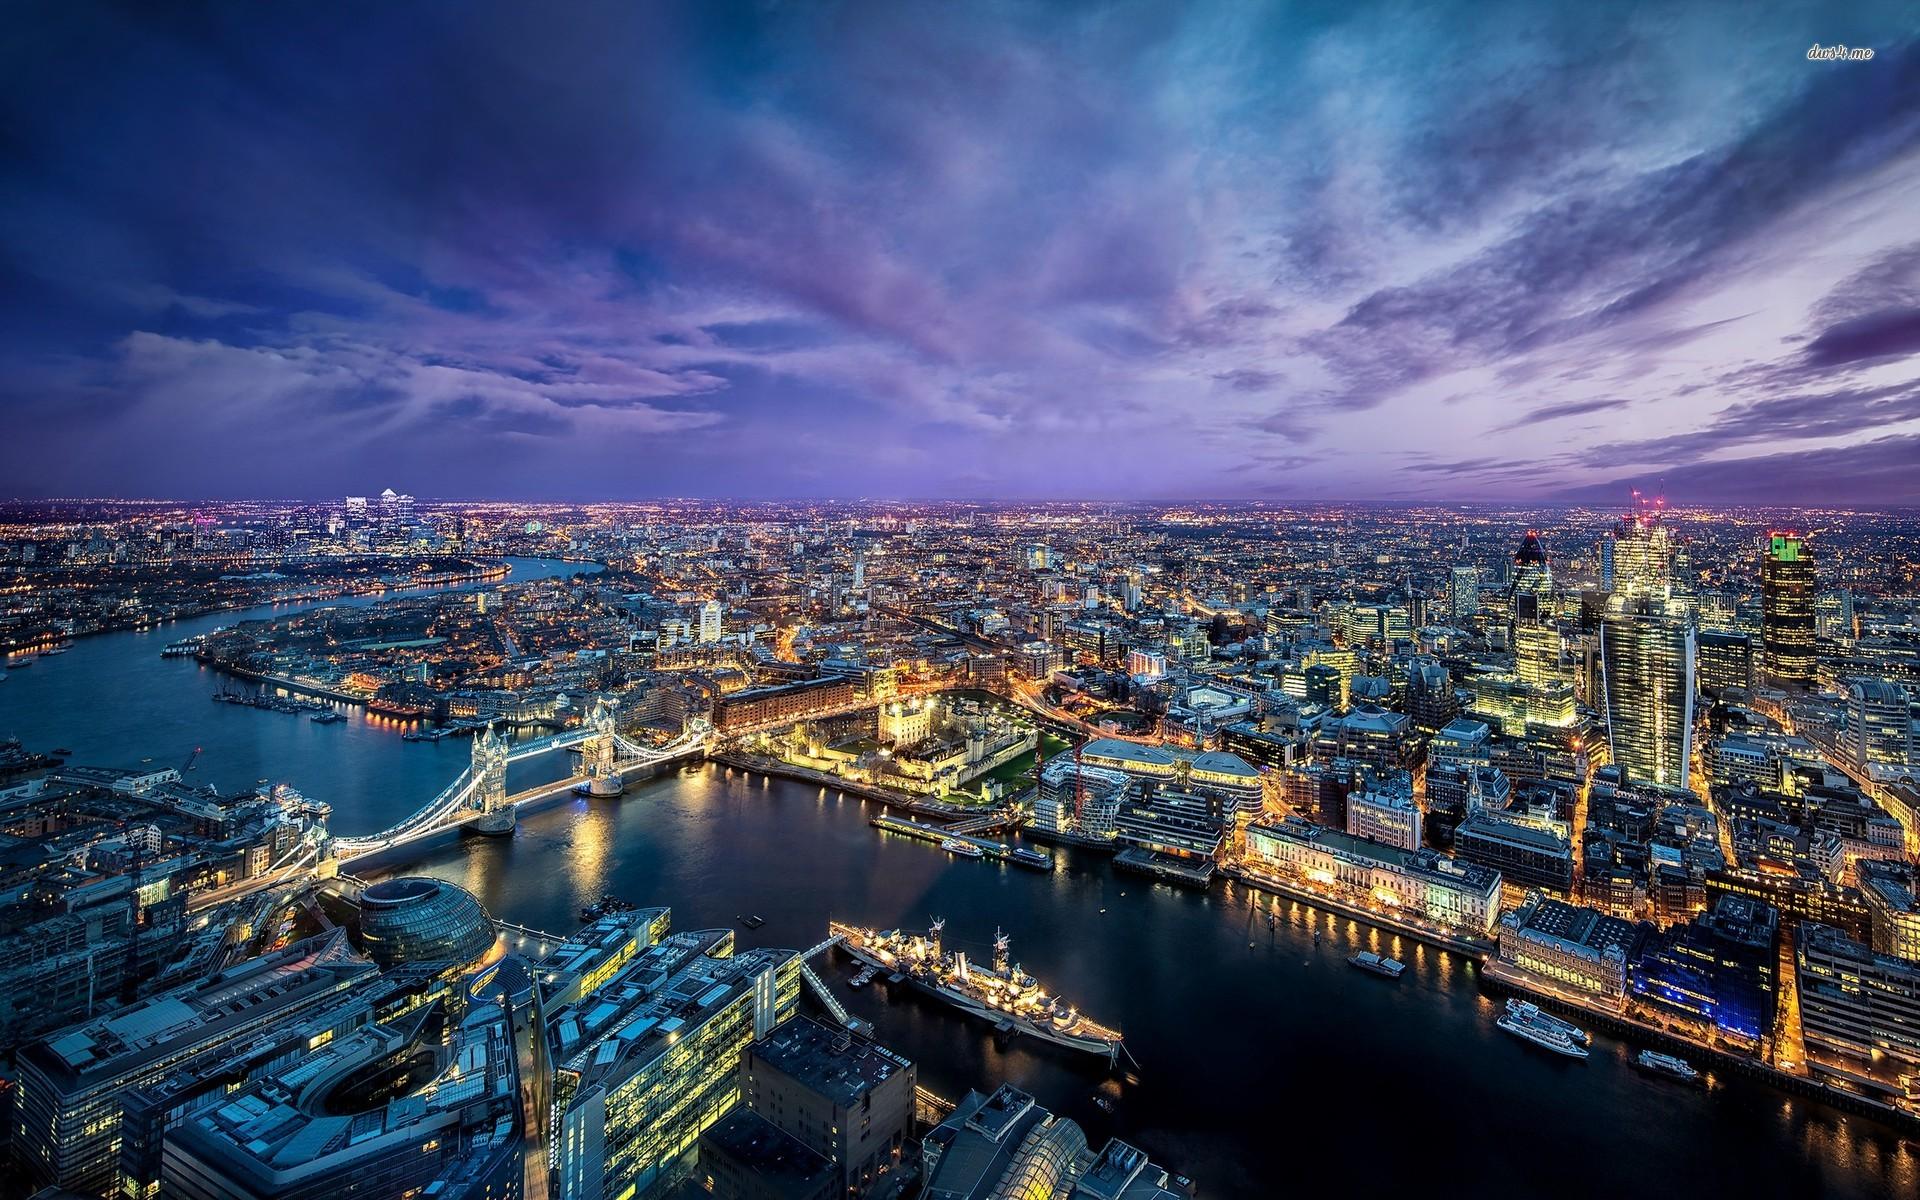 London Wallpapers Hd Wallpapers Pulse